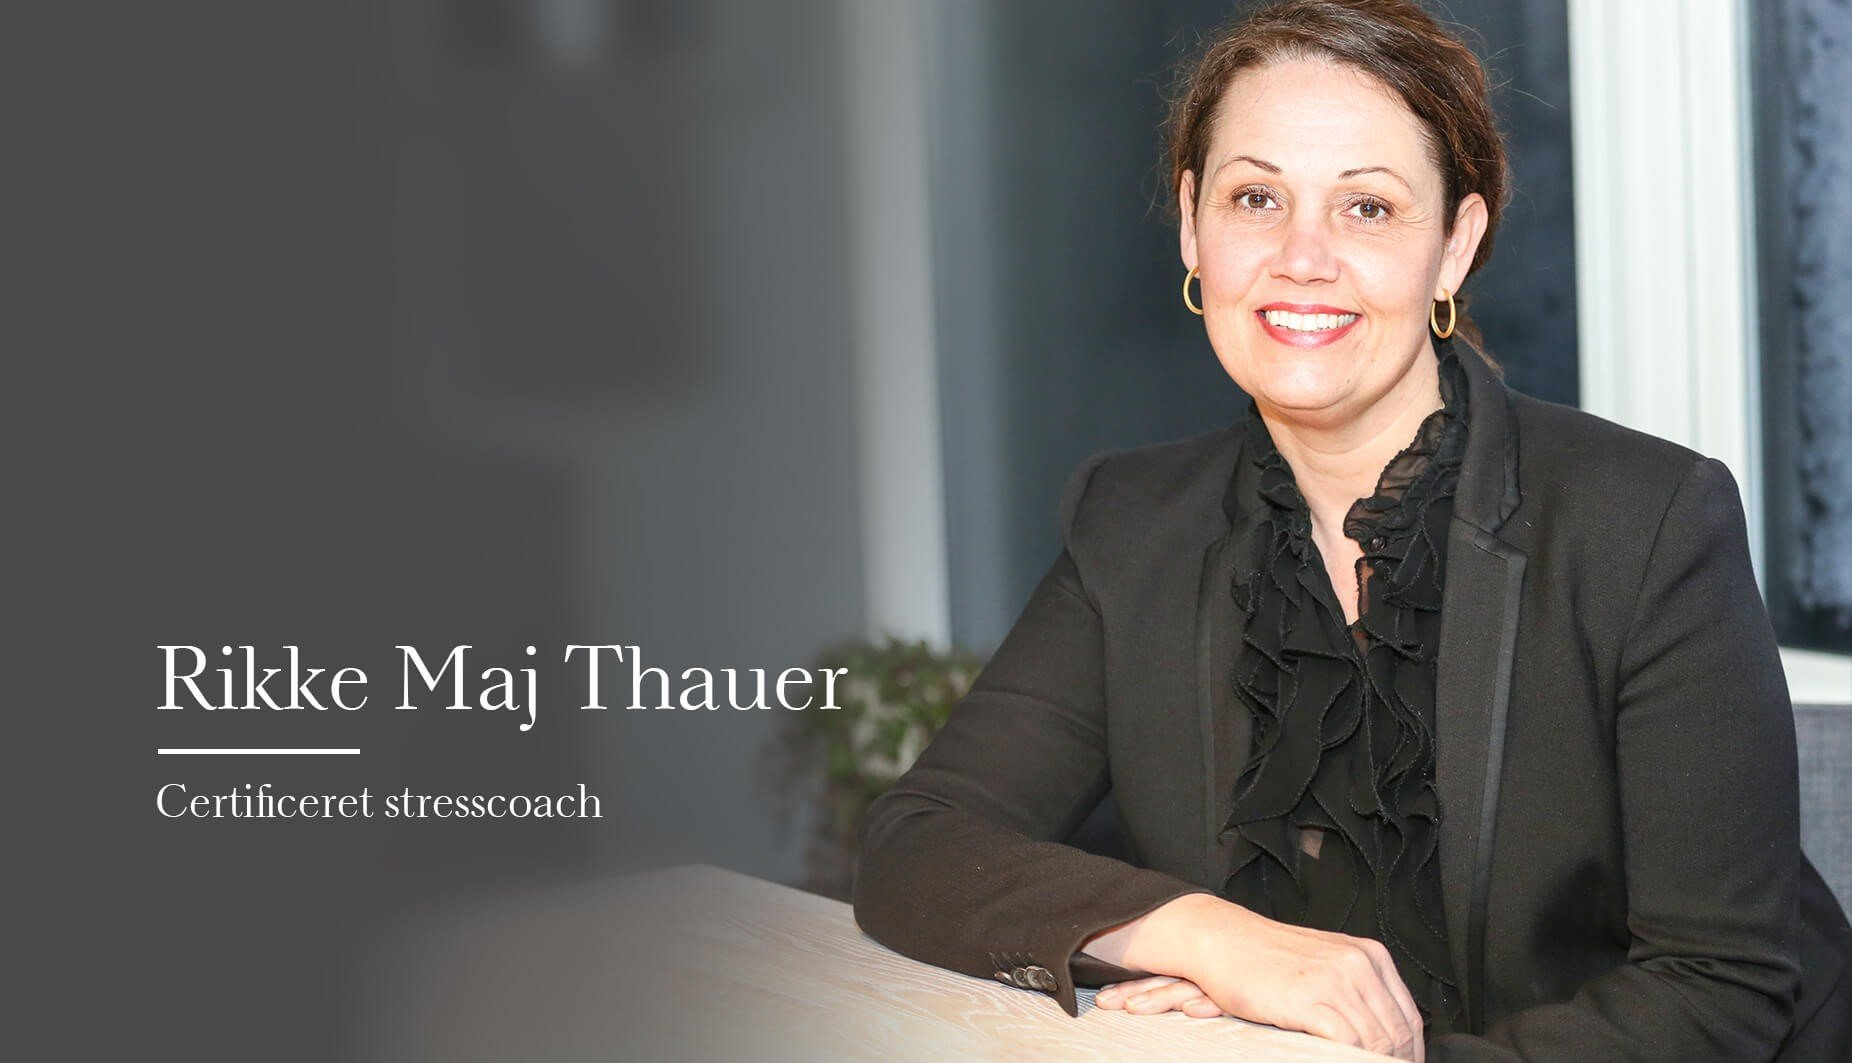 Rikke maj thauer - foredrag -stresscoach - speakerslounge